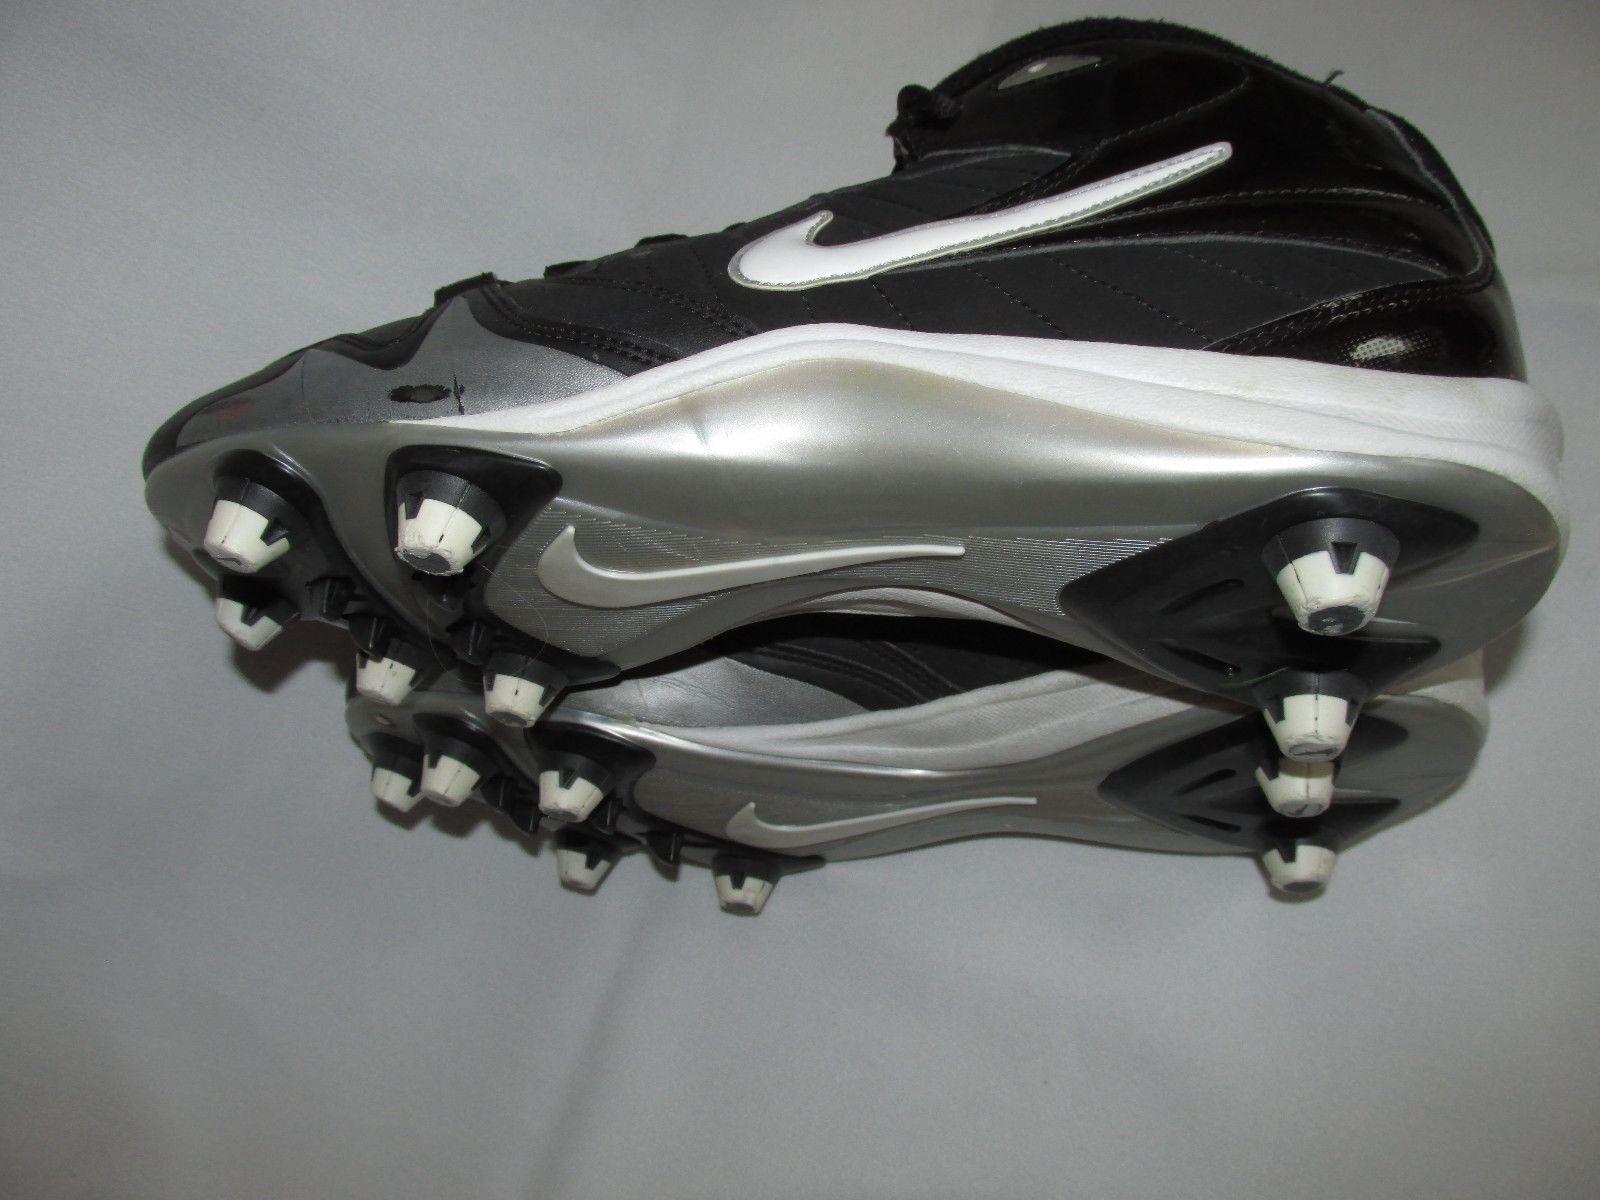 sale retailer 4fb63 38f95 ... Nike Strike Strike Strike Force Mens Football Cleats 317773 US 8.5  1d3956 ...